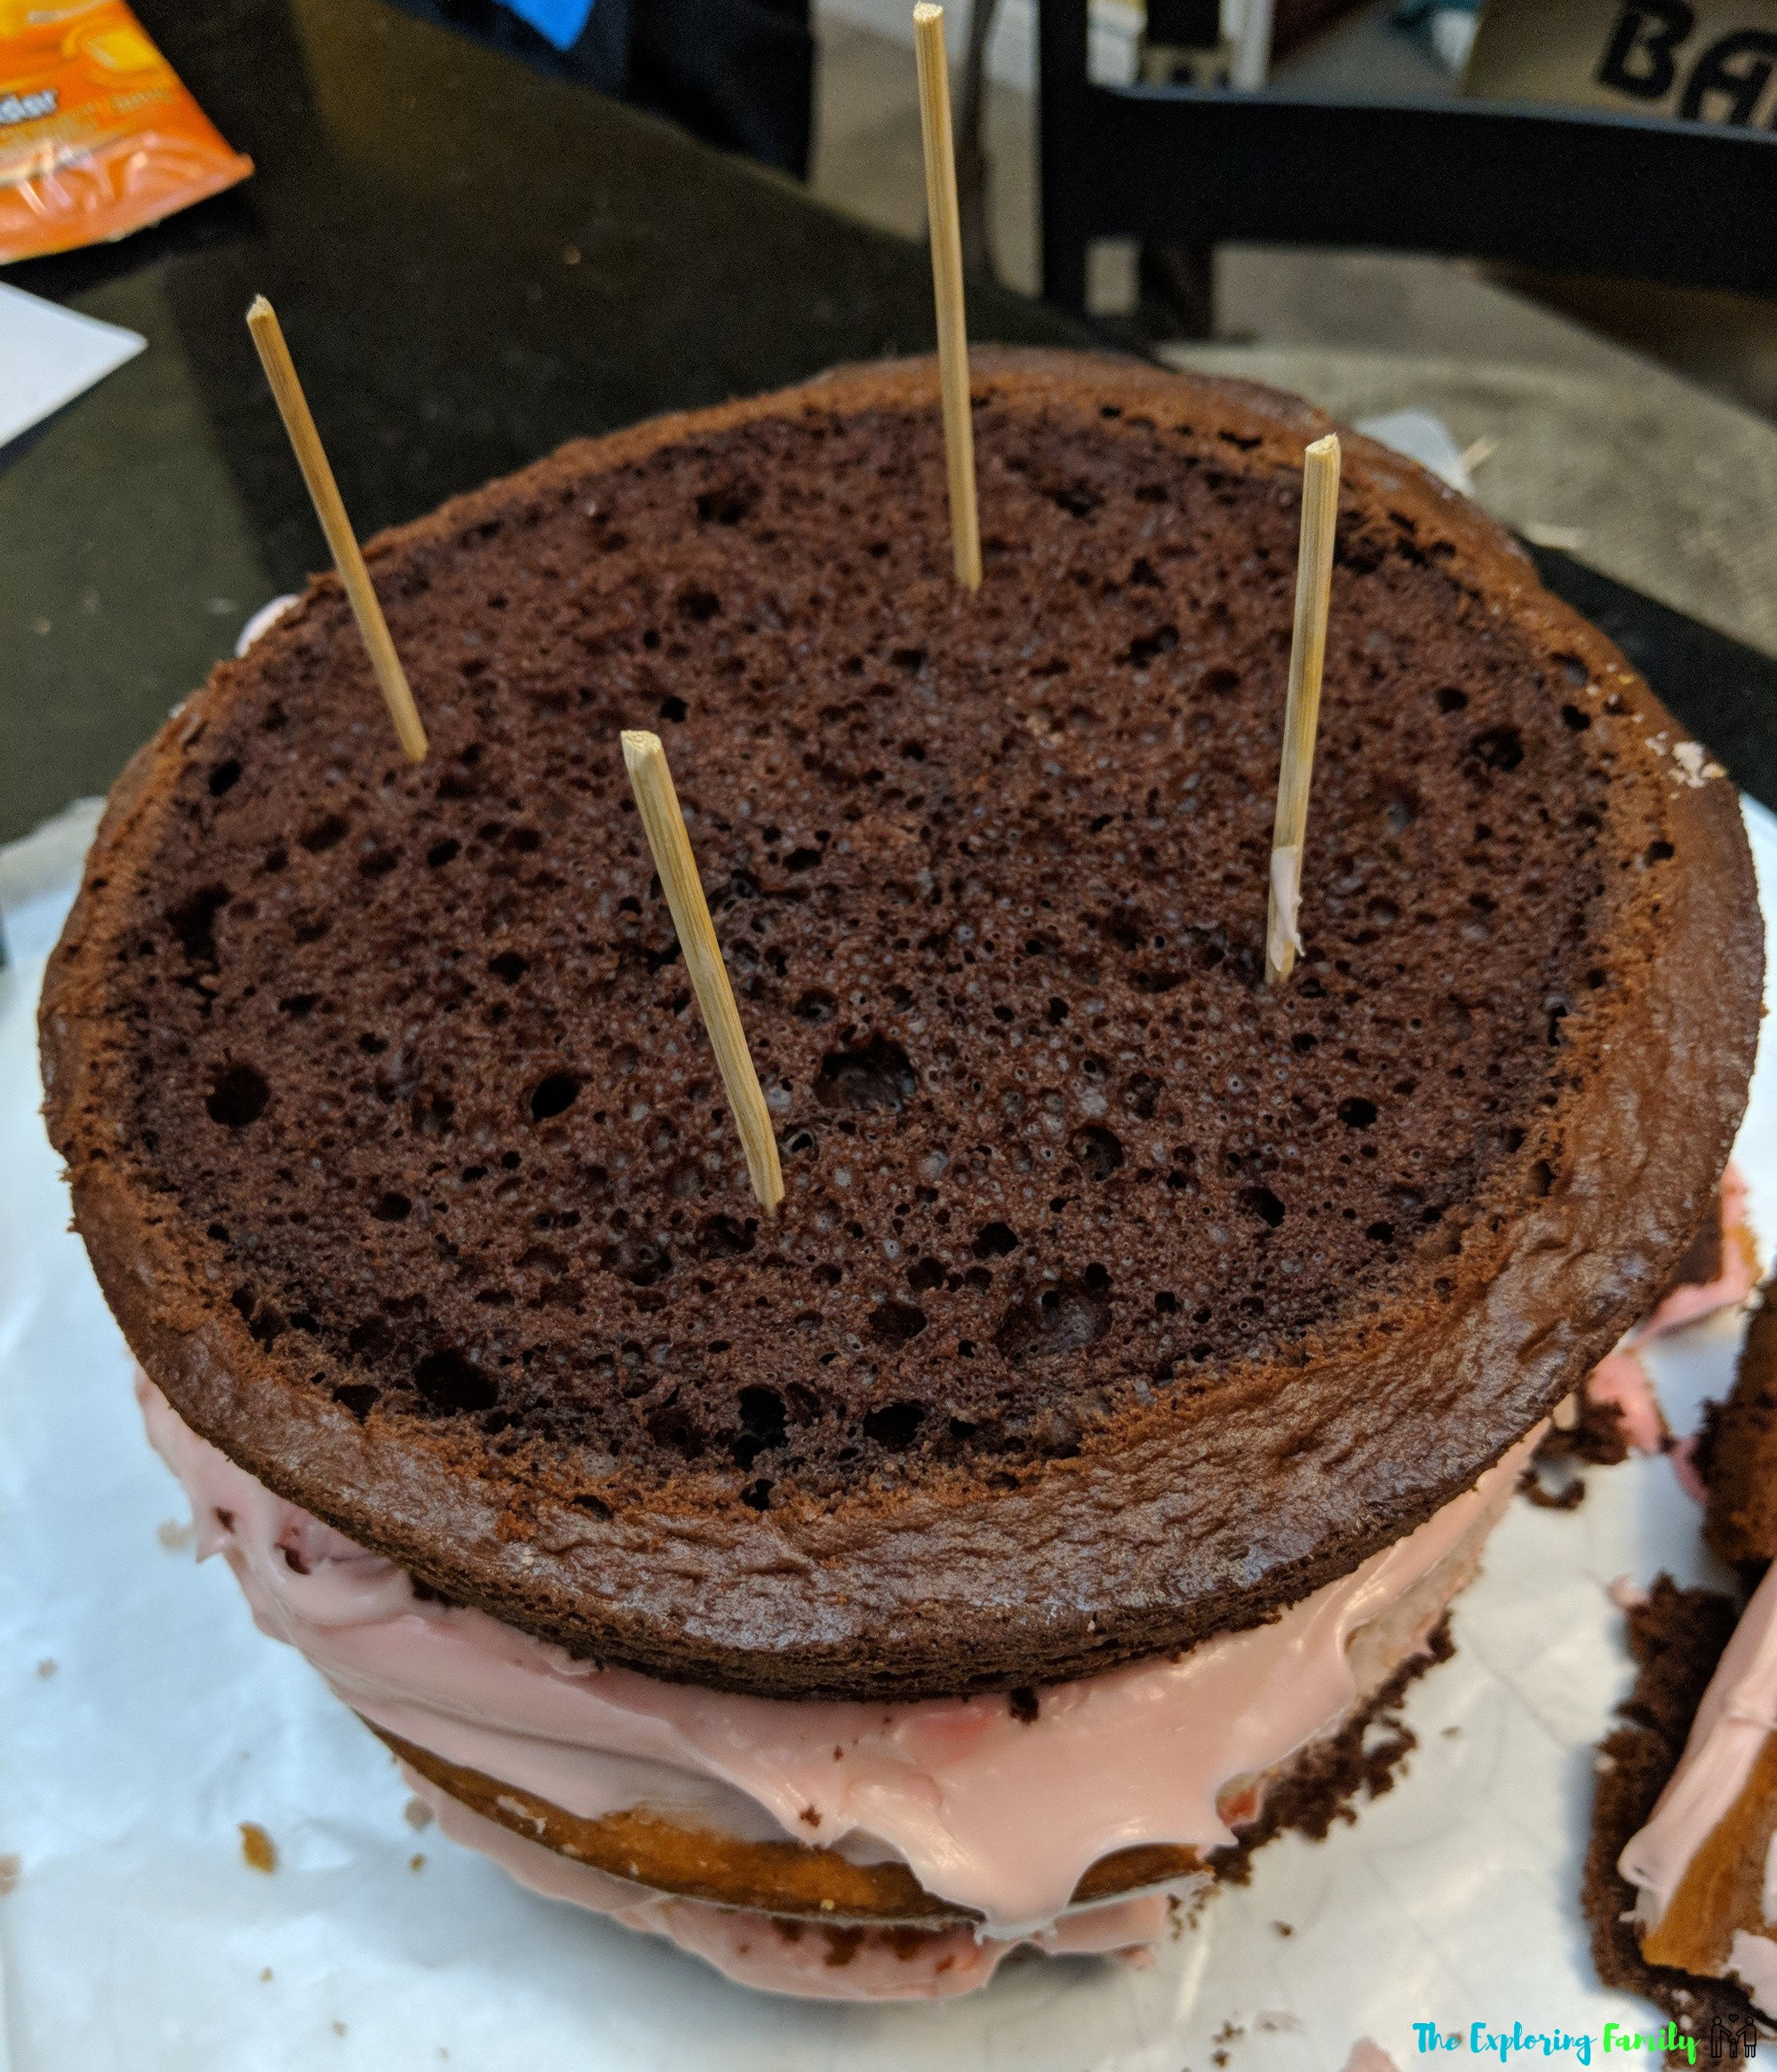 Chocolate DIY Unicorn Cake Recipe Instructions